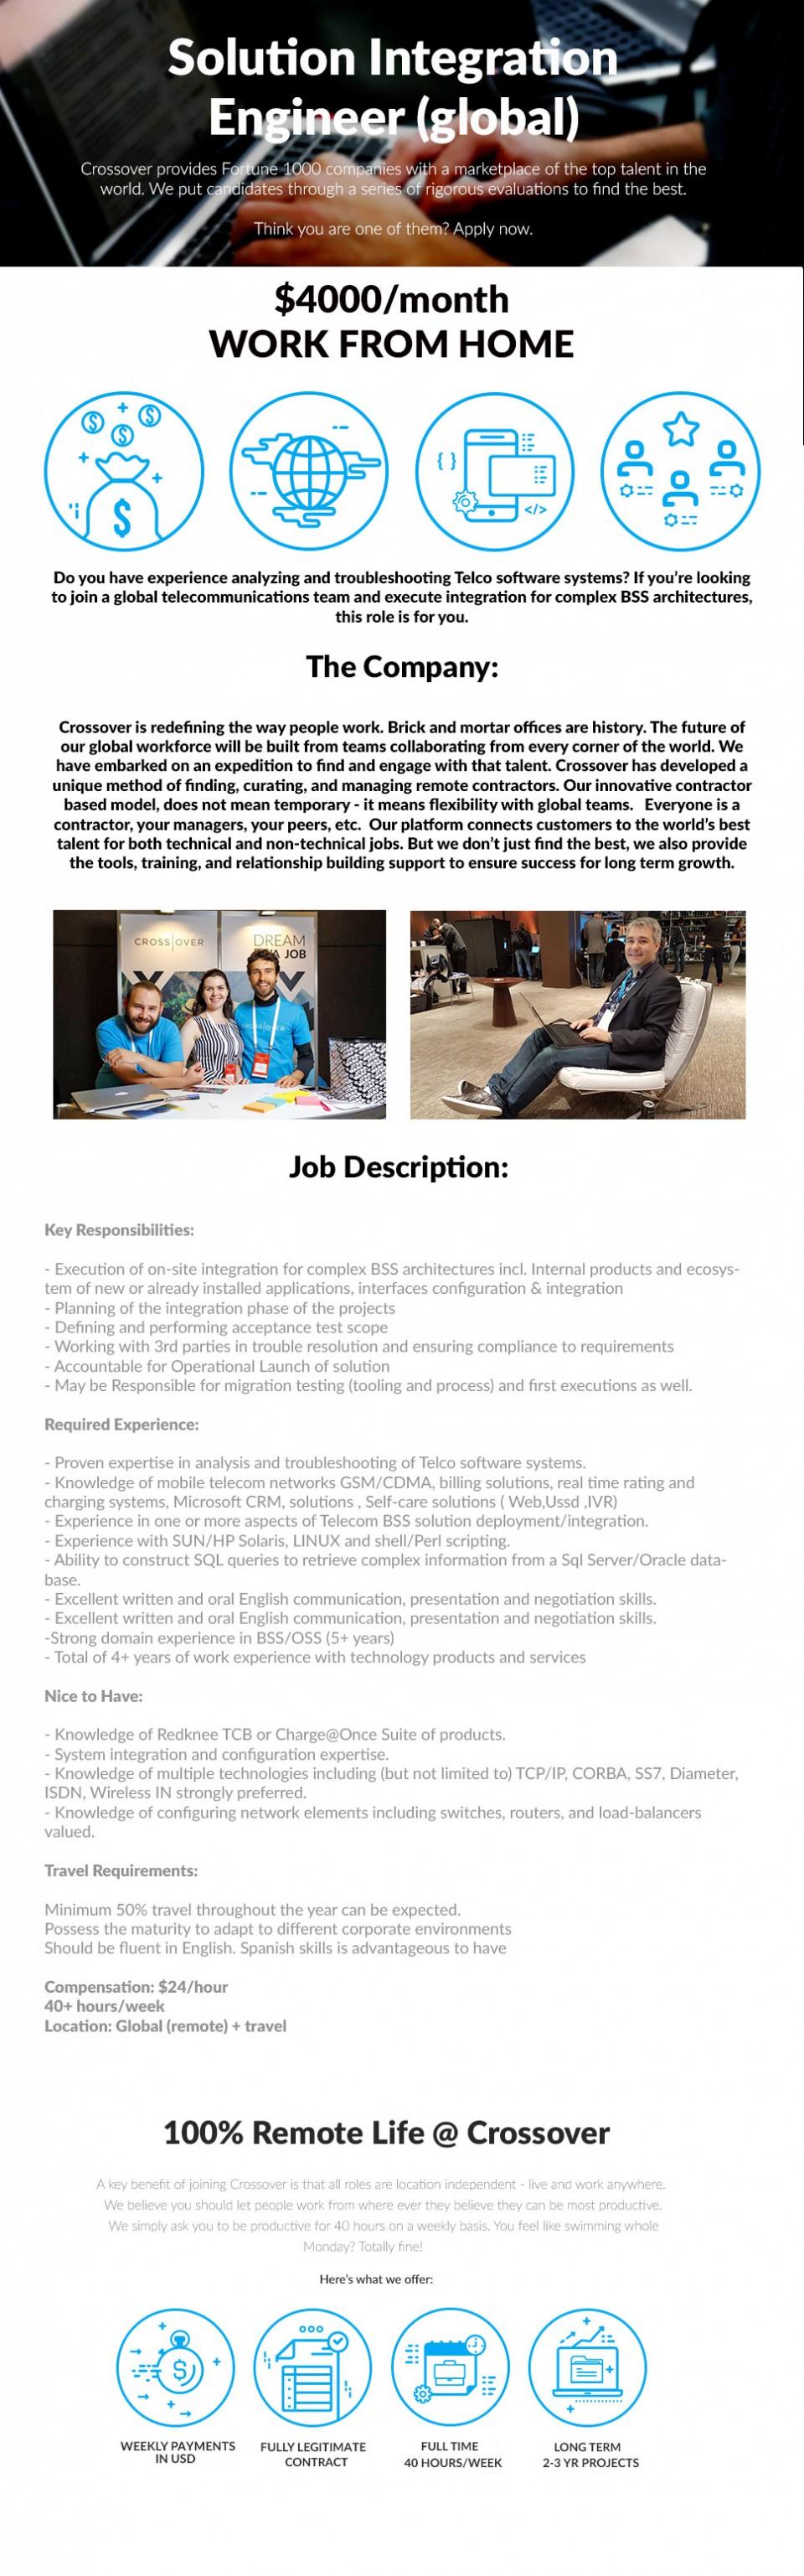 Solution Integration Engineer (Global) - $4000/mth - REMOTE